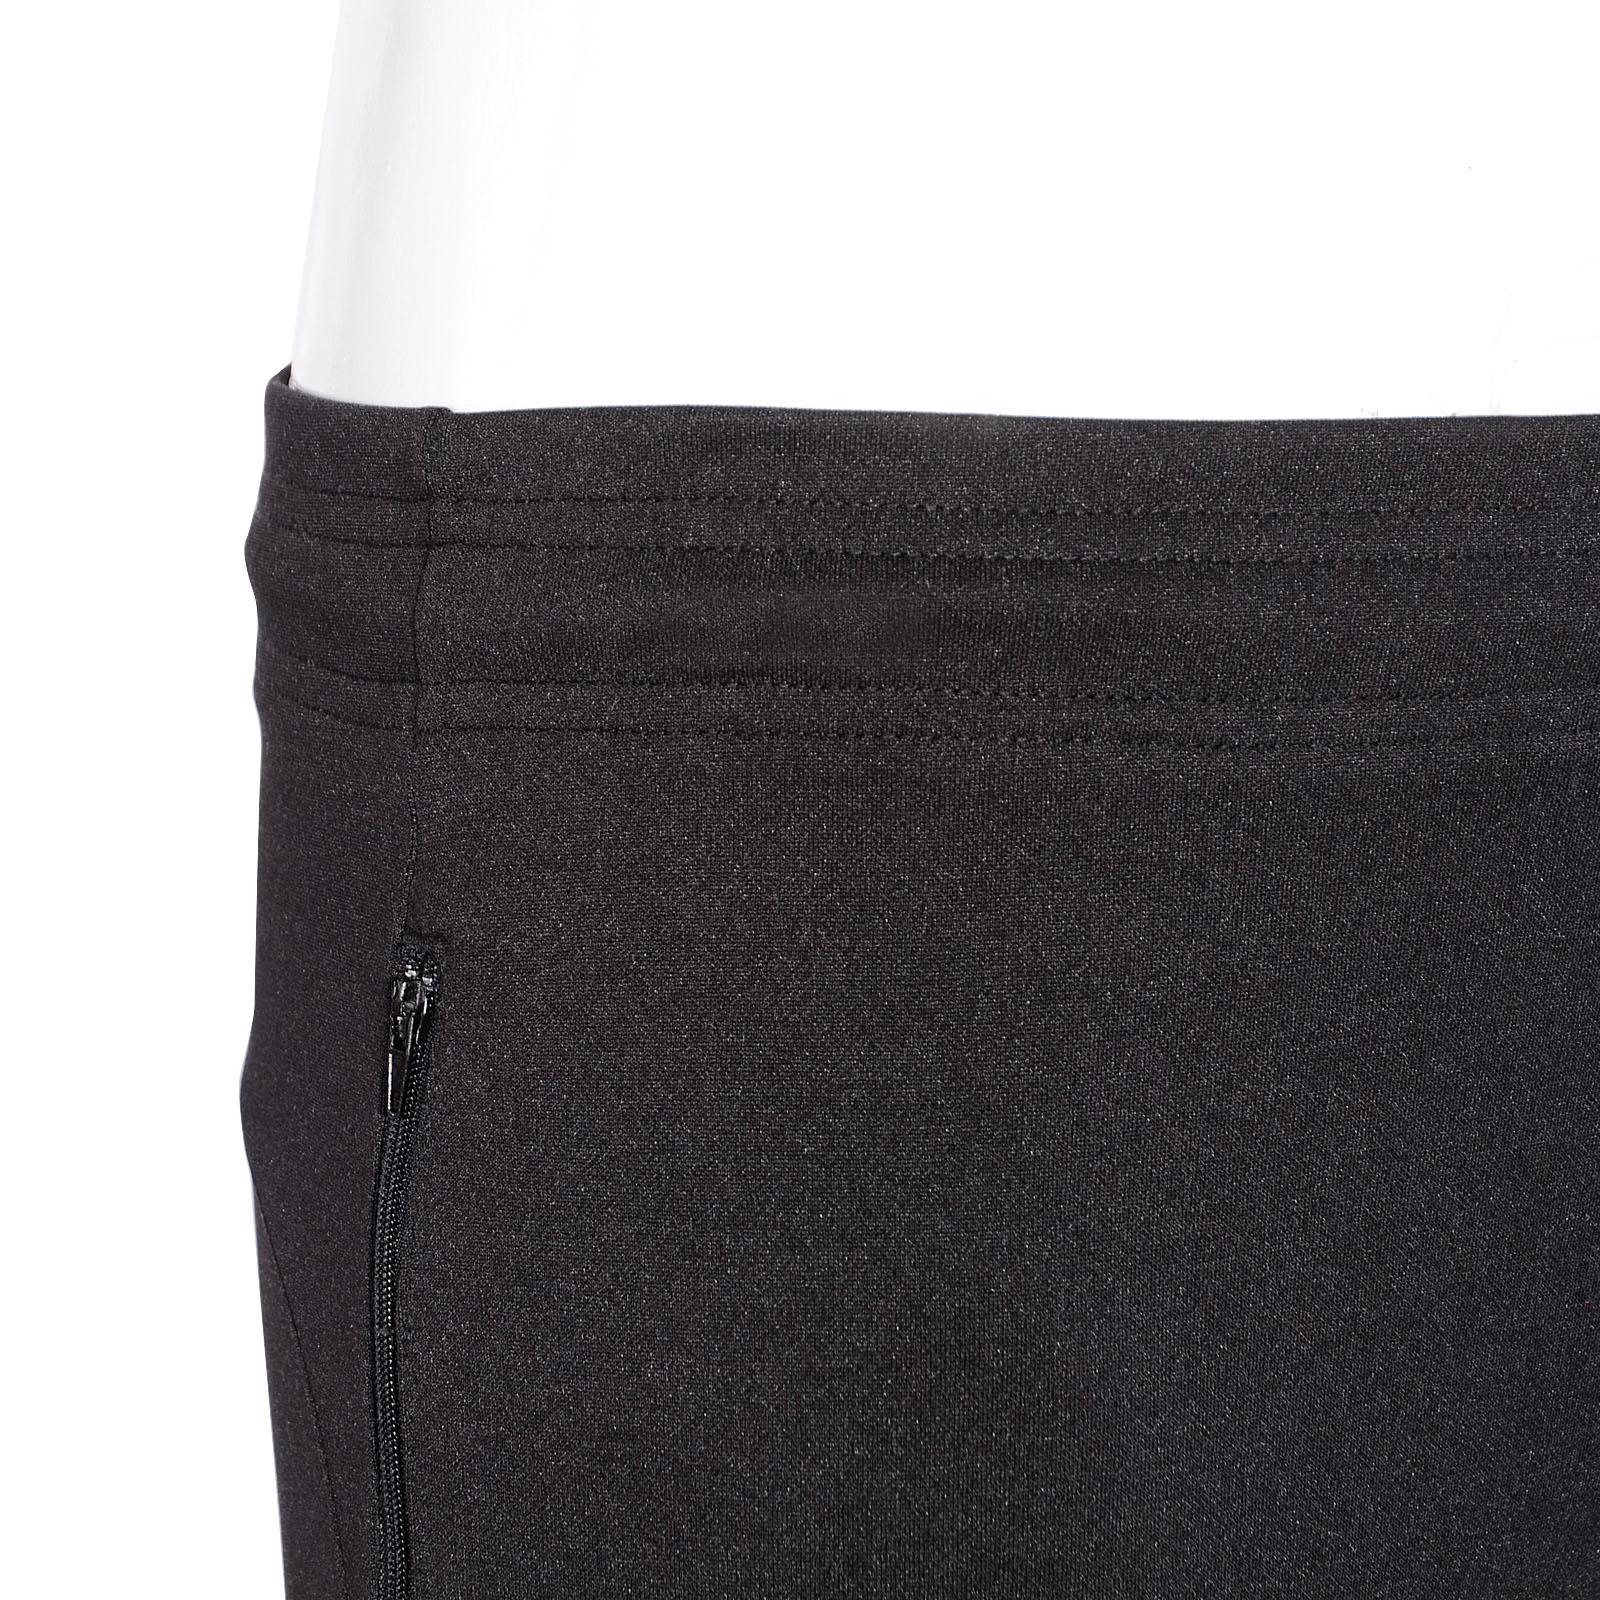 homme collant course pantalon serre exercice leggings. Black Bedroom Furniture Sets. Home Design Ideas